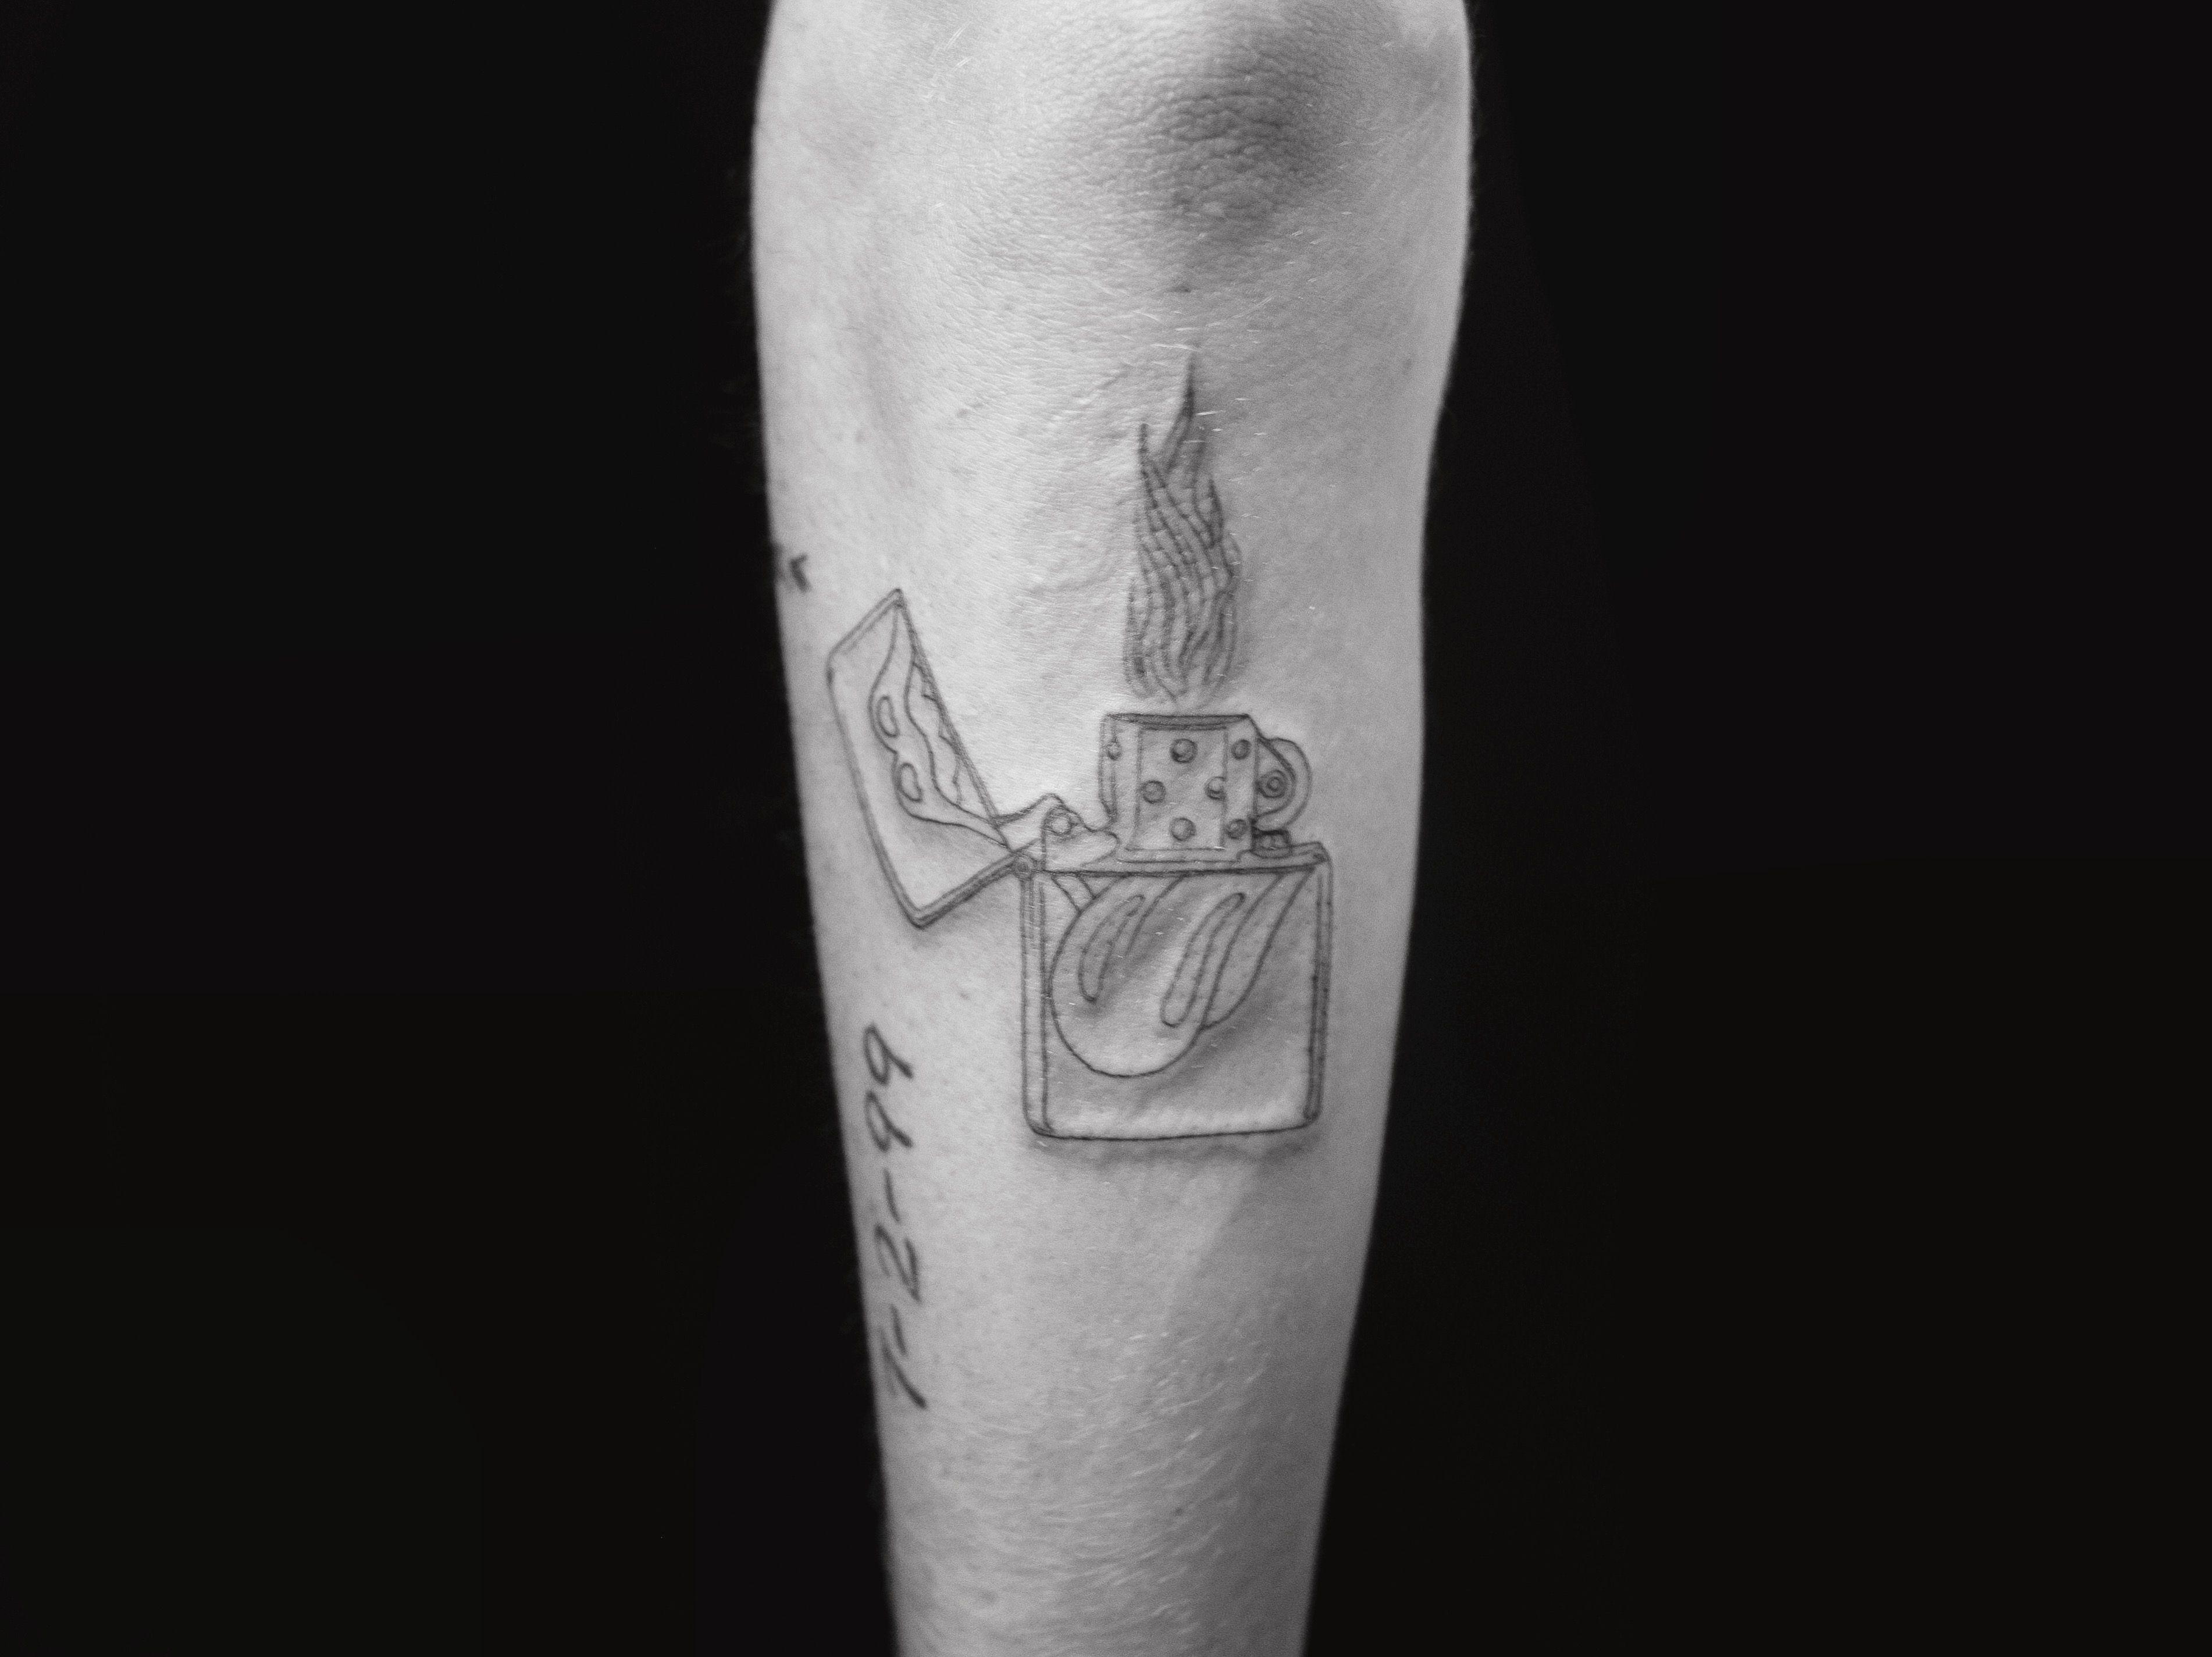 Single needle Rolling Stones zippo lighter tattoo on